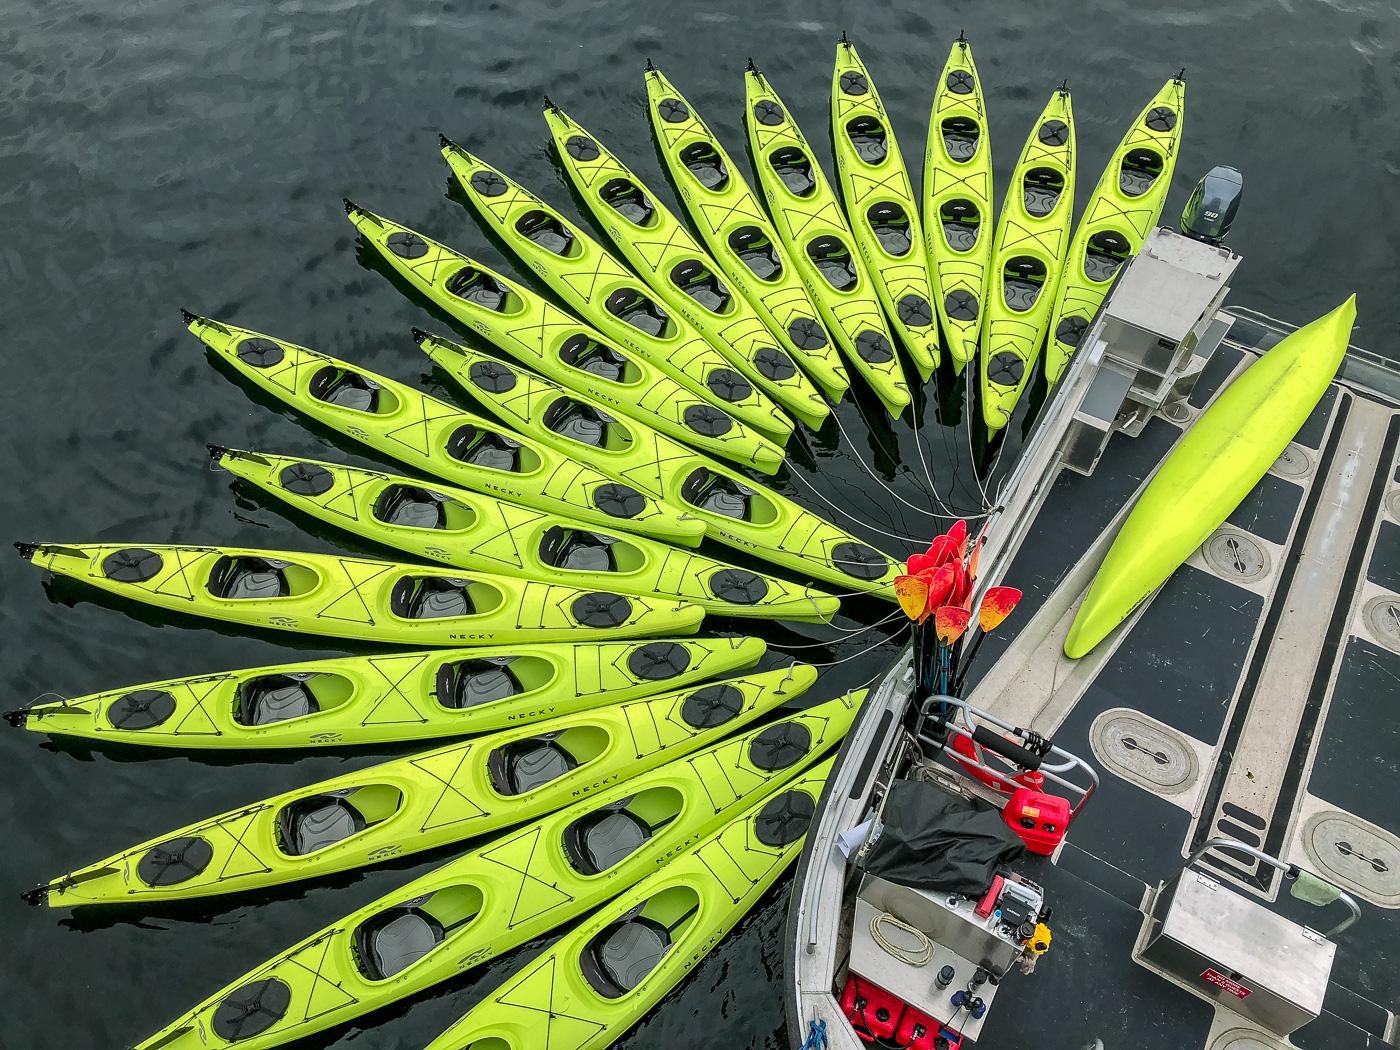 UnCruise kayak fantail during an adventure cruise